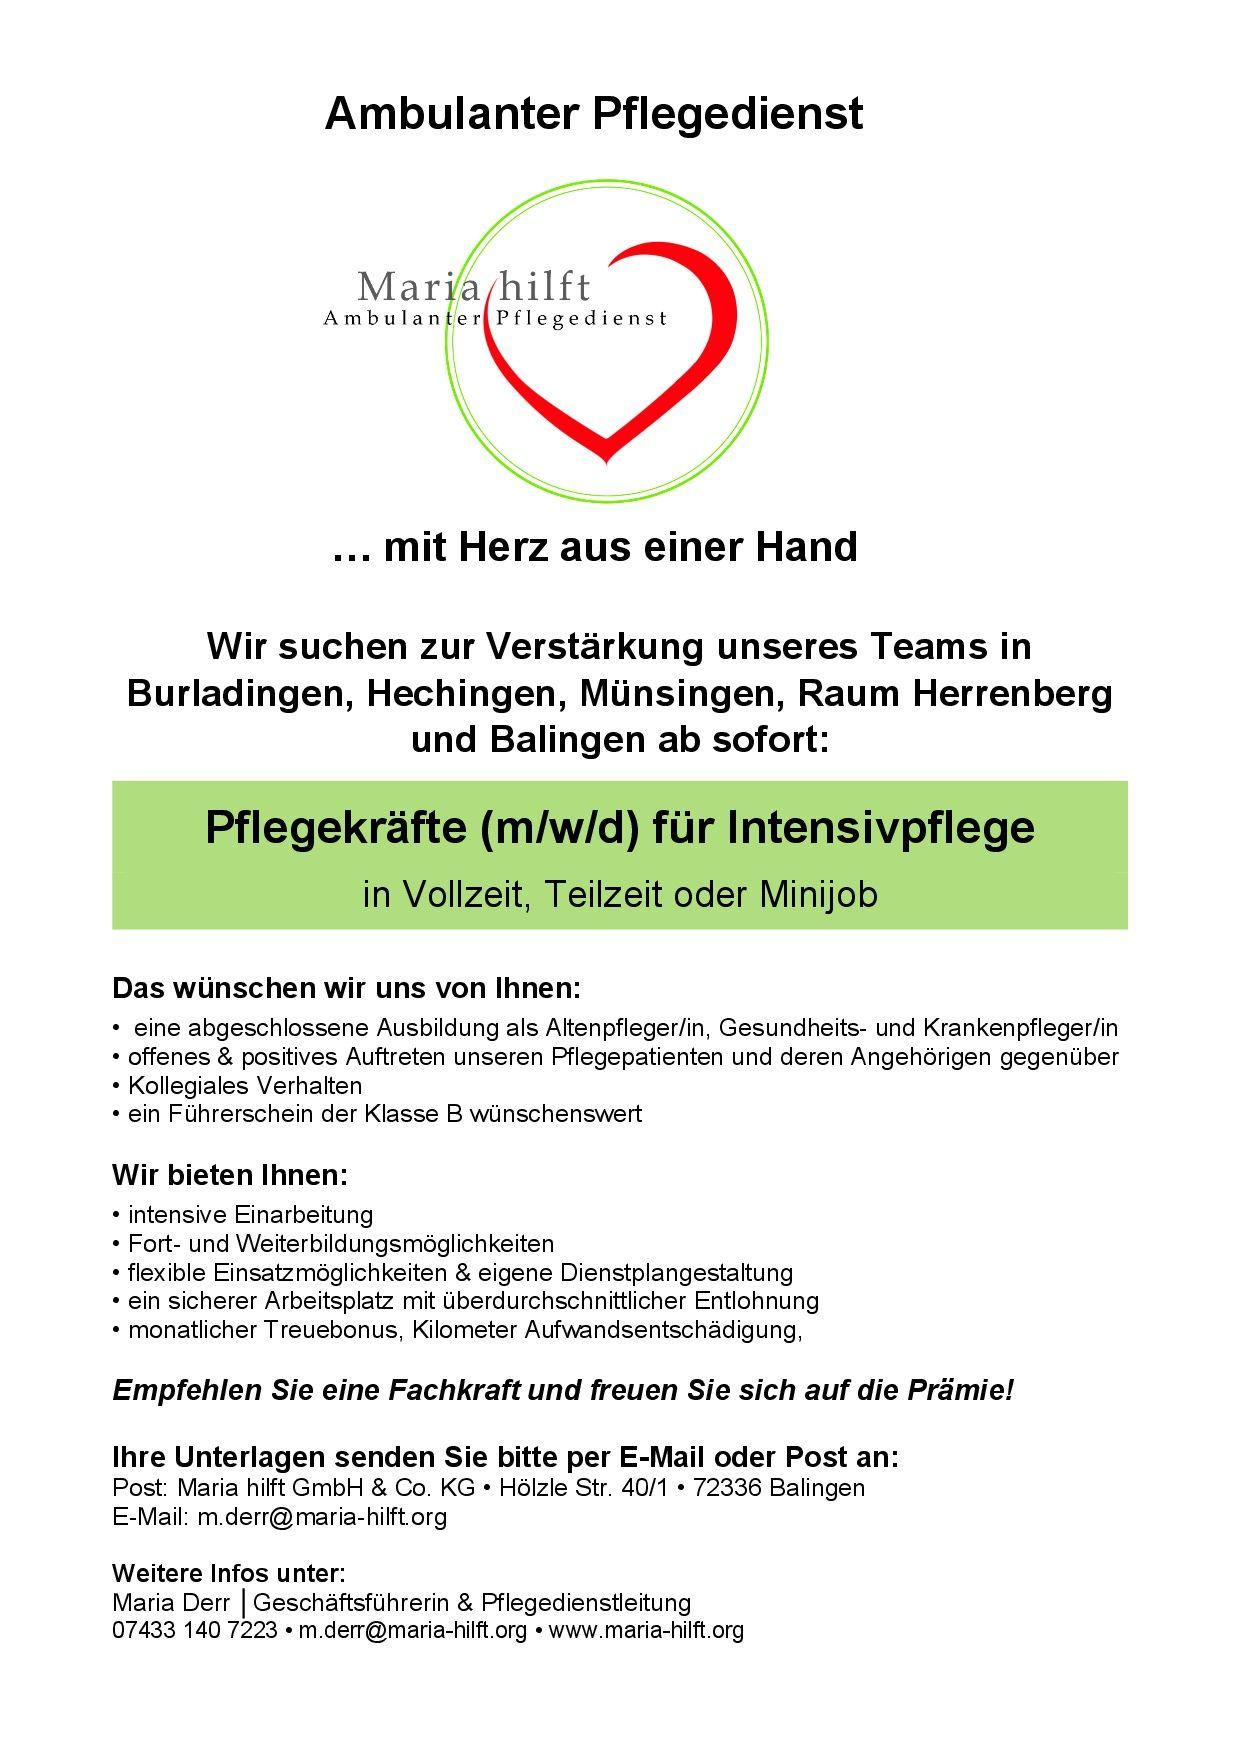 Maria hilft GmbH & Co. KG Website